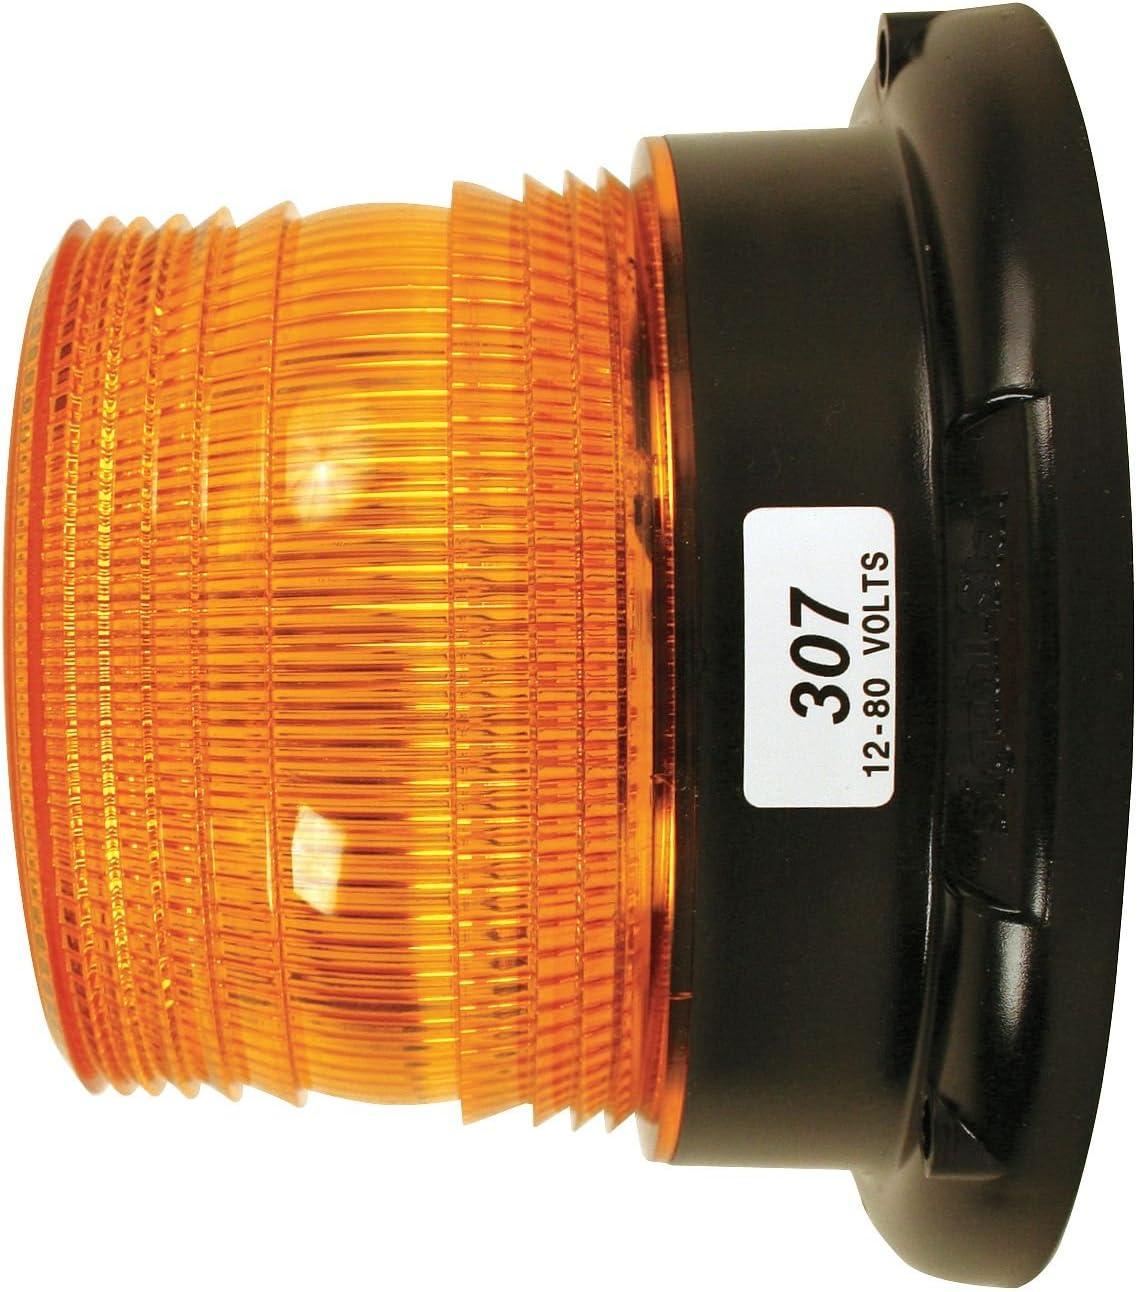 permanent mount 12-80 VDC Truck-Lite 307A Low Profile Strobe Light Yellow